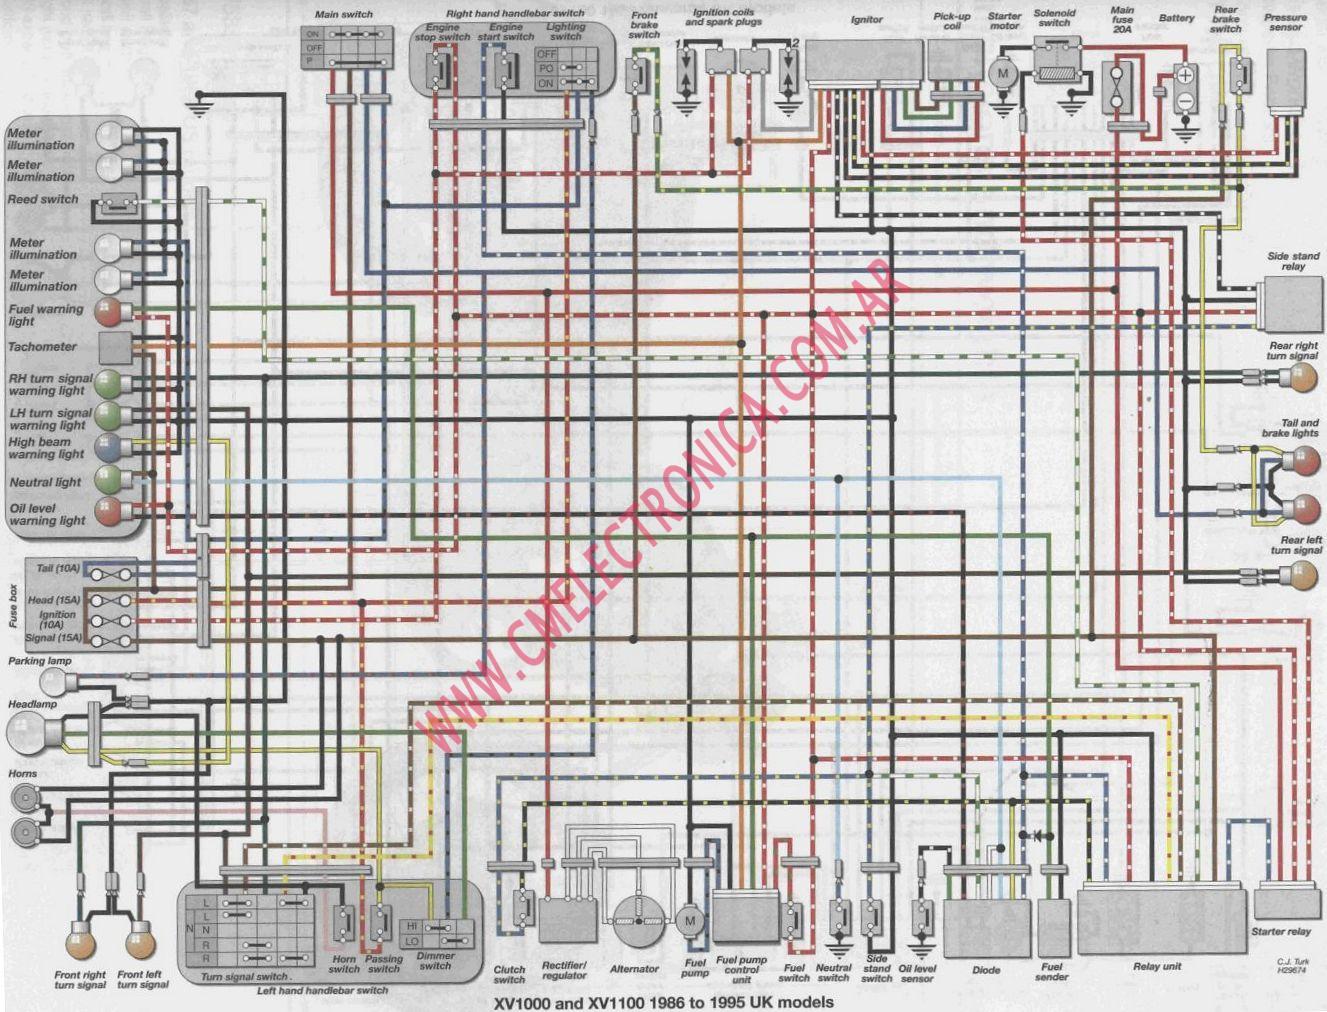 2002 yamaha virago 250 wiring diagram baldor three phase motor xv 9 kenmo lp de xv1000 schematic rh 3 twizer co 1100cc yzf